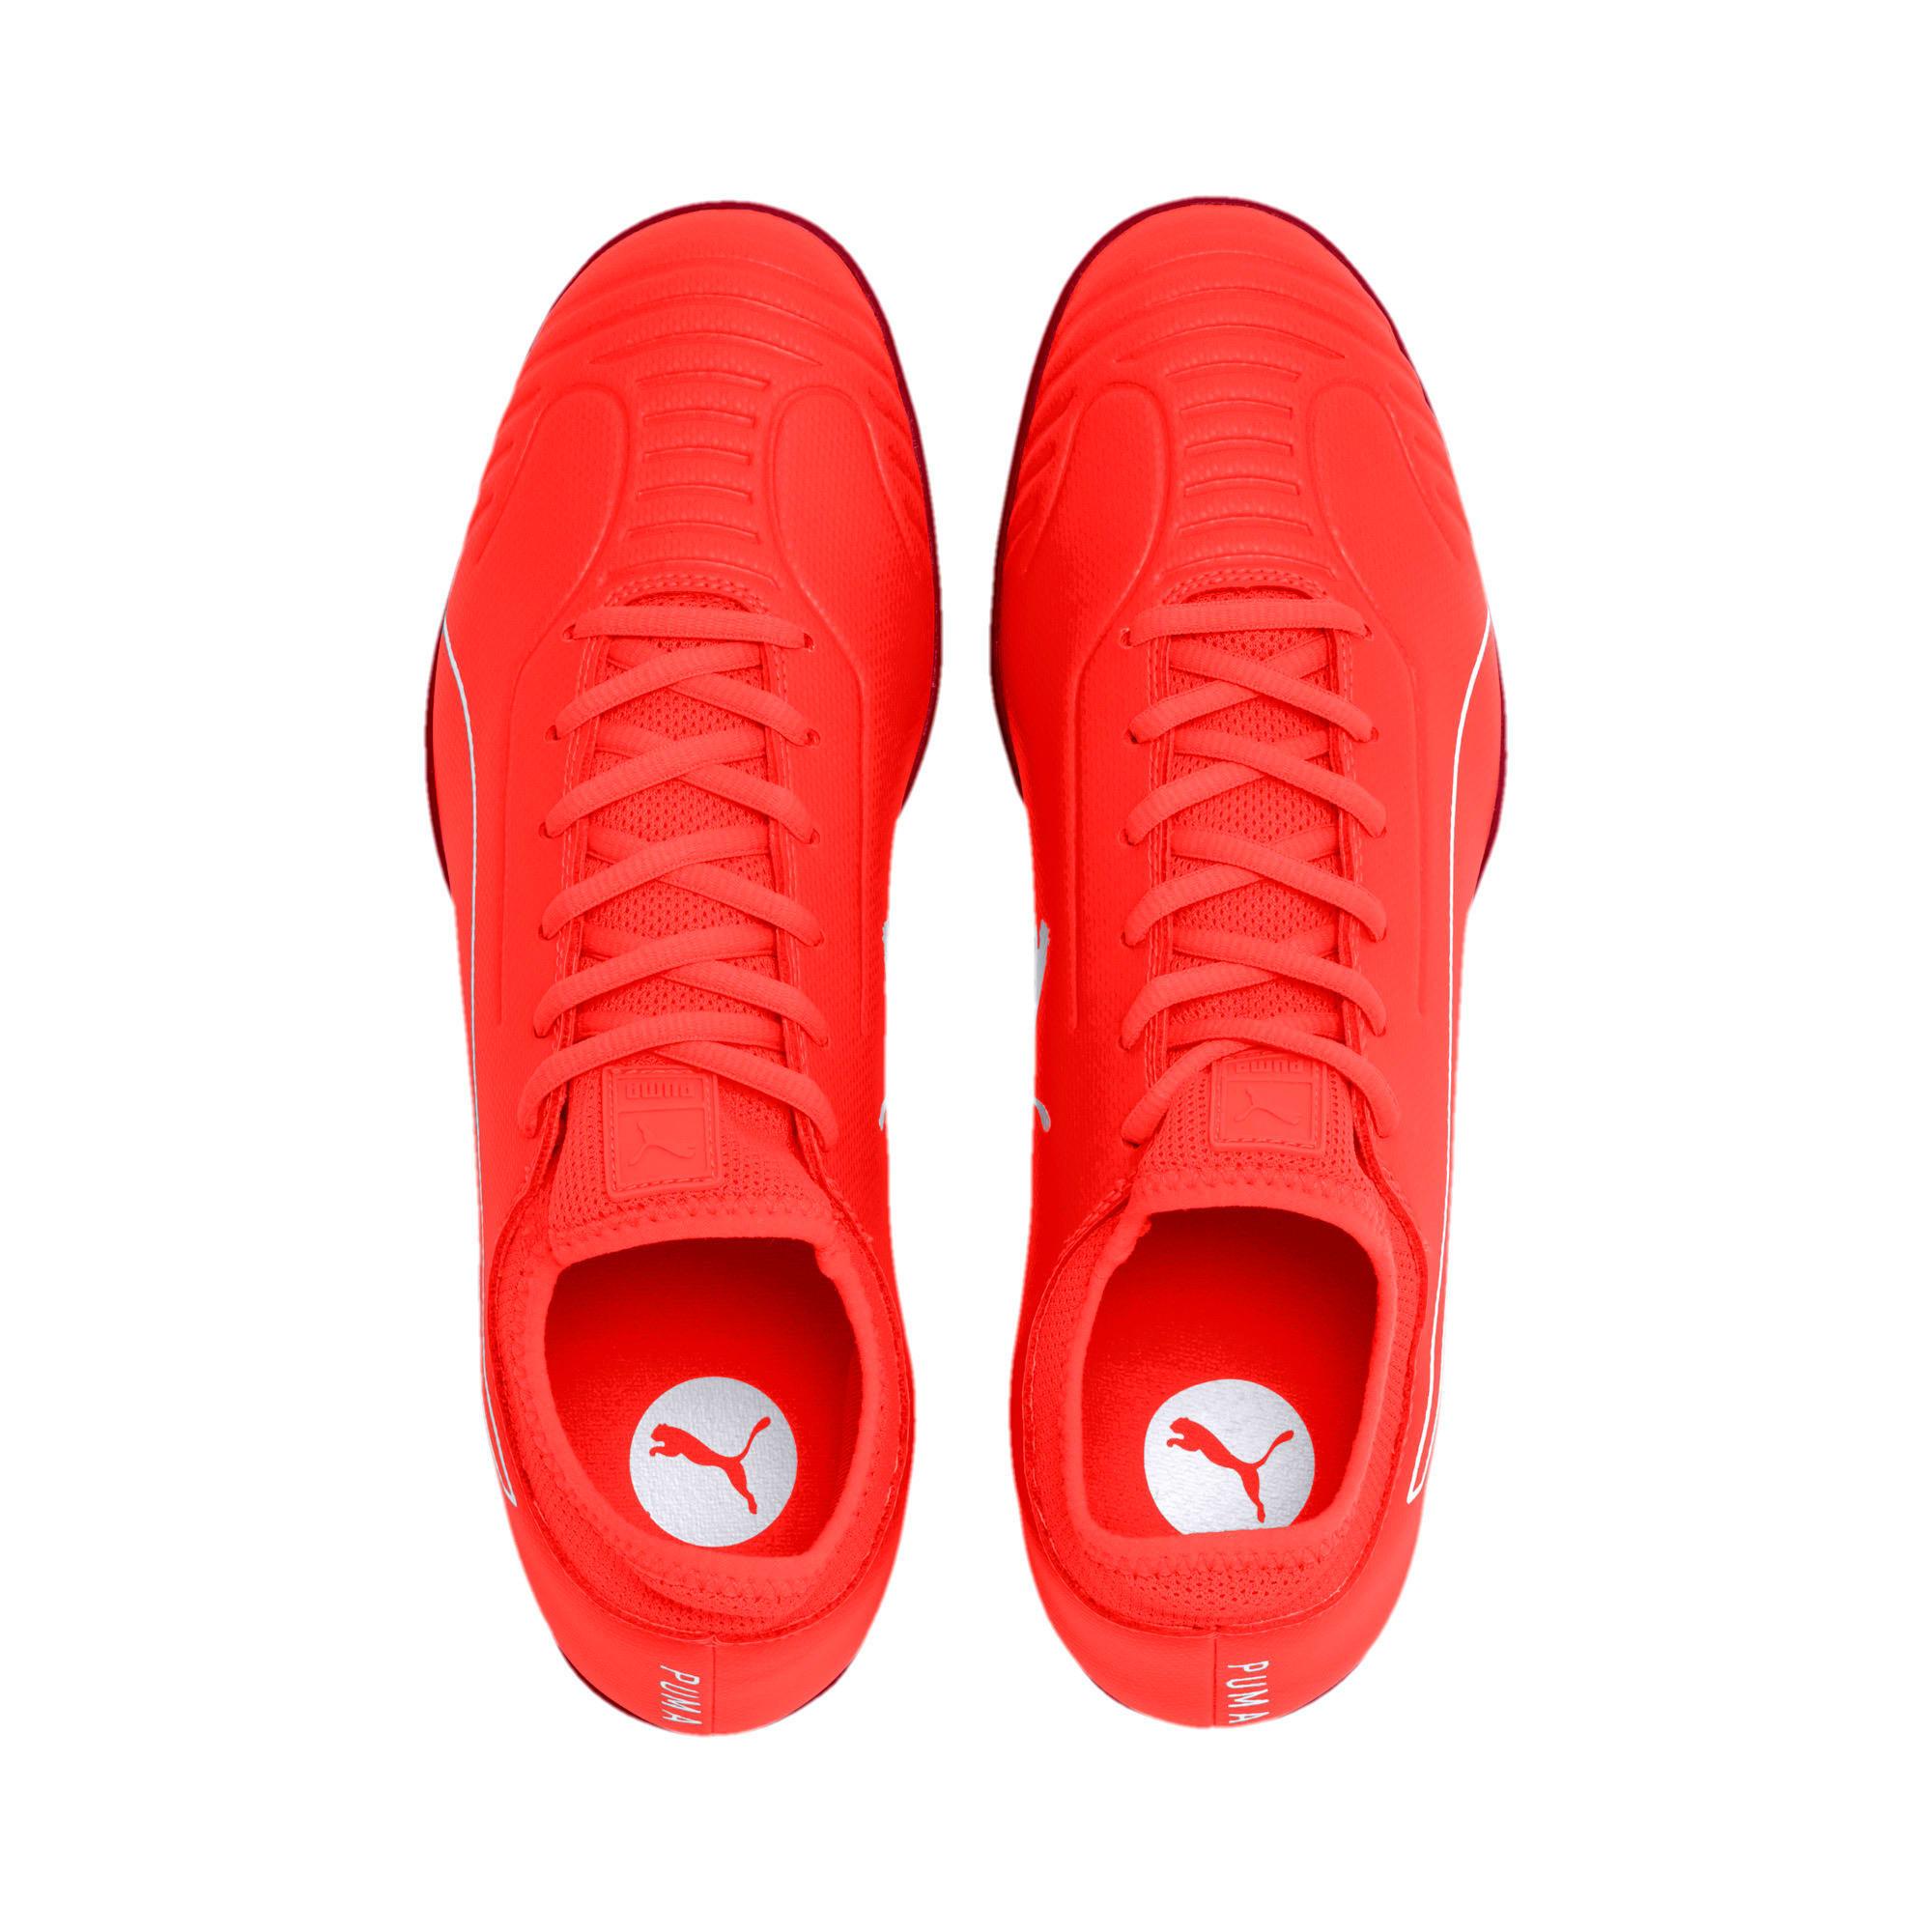 Thumbnail 7 of 365 Sala 2 Men's Soccer Shoes, Nrgy Red-Rhubarb, medium